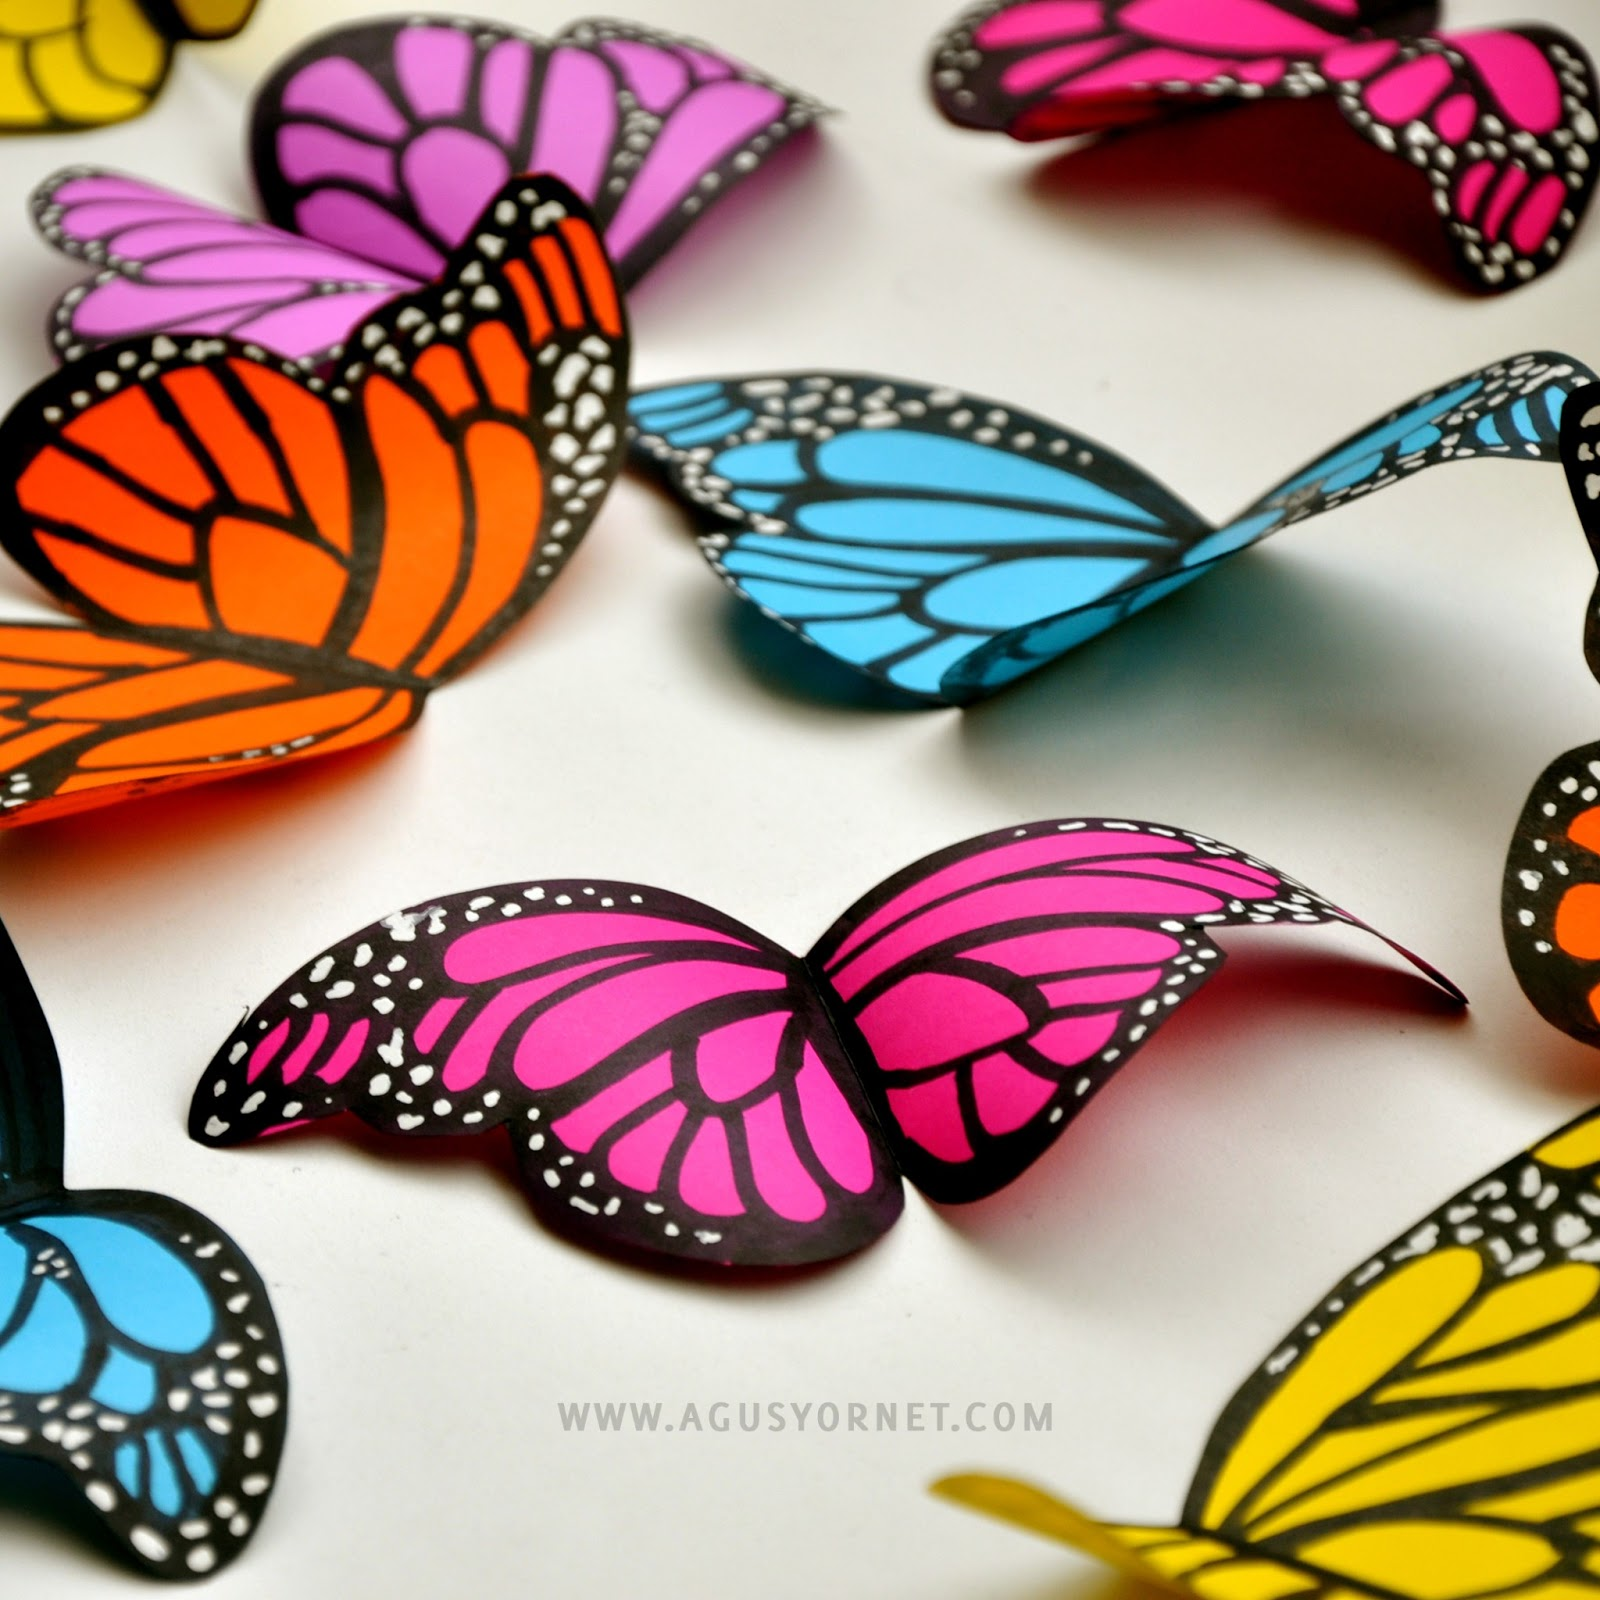 Diy paper butterflies agus yornet blog - Mariposas para pared ...